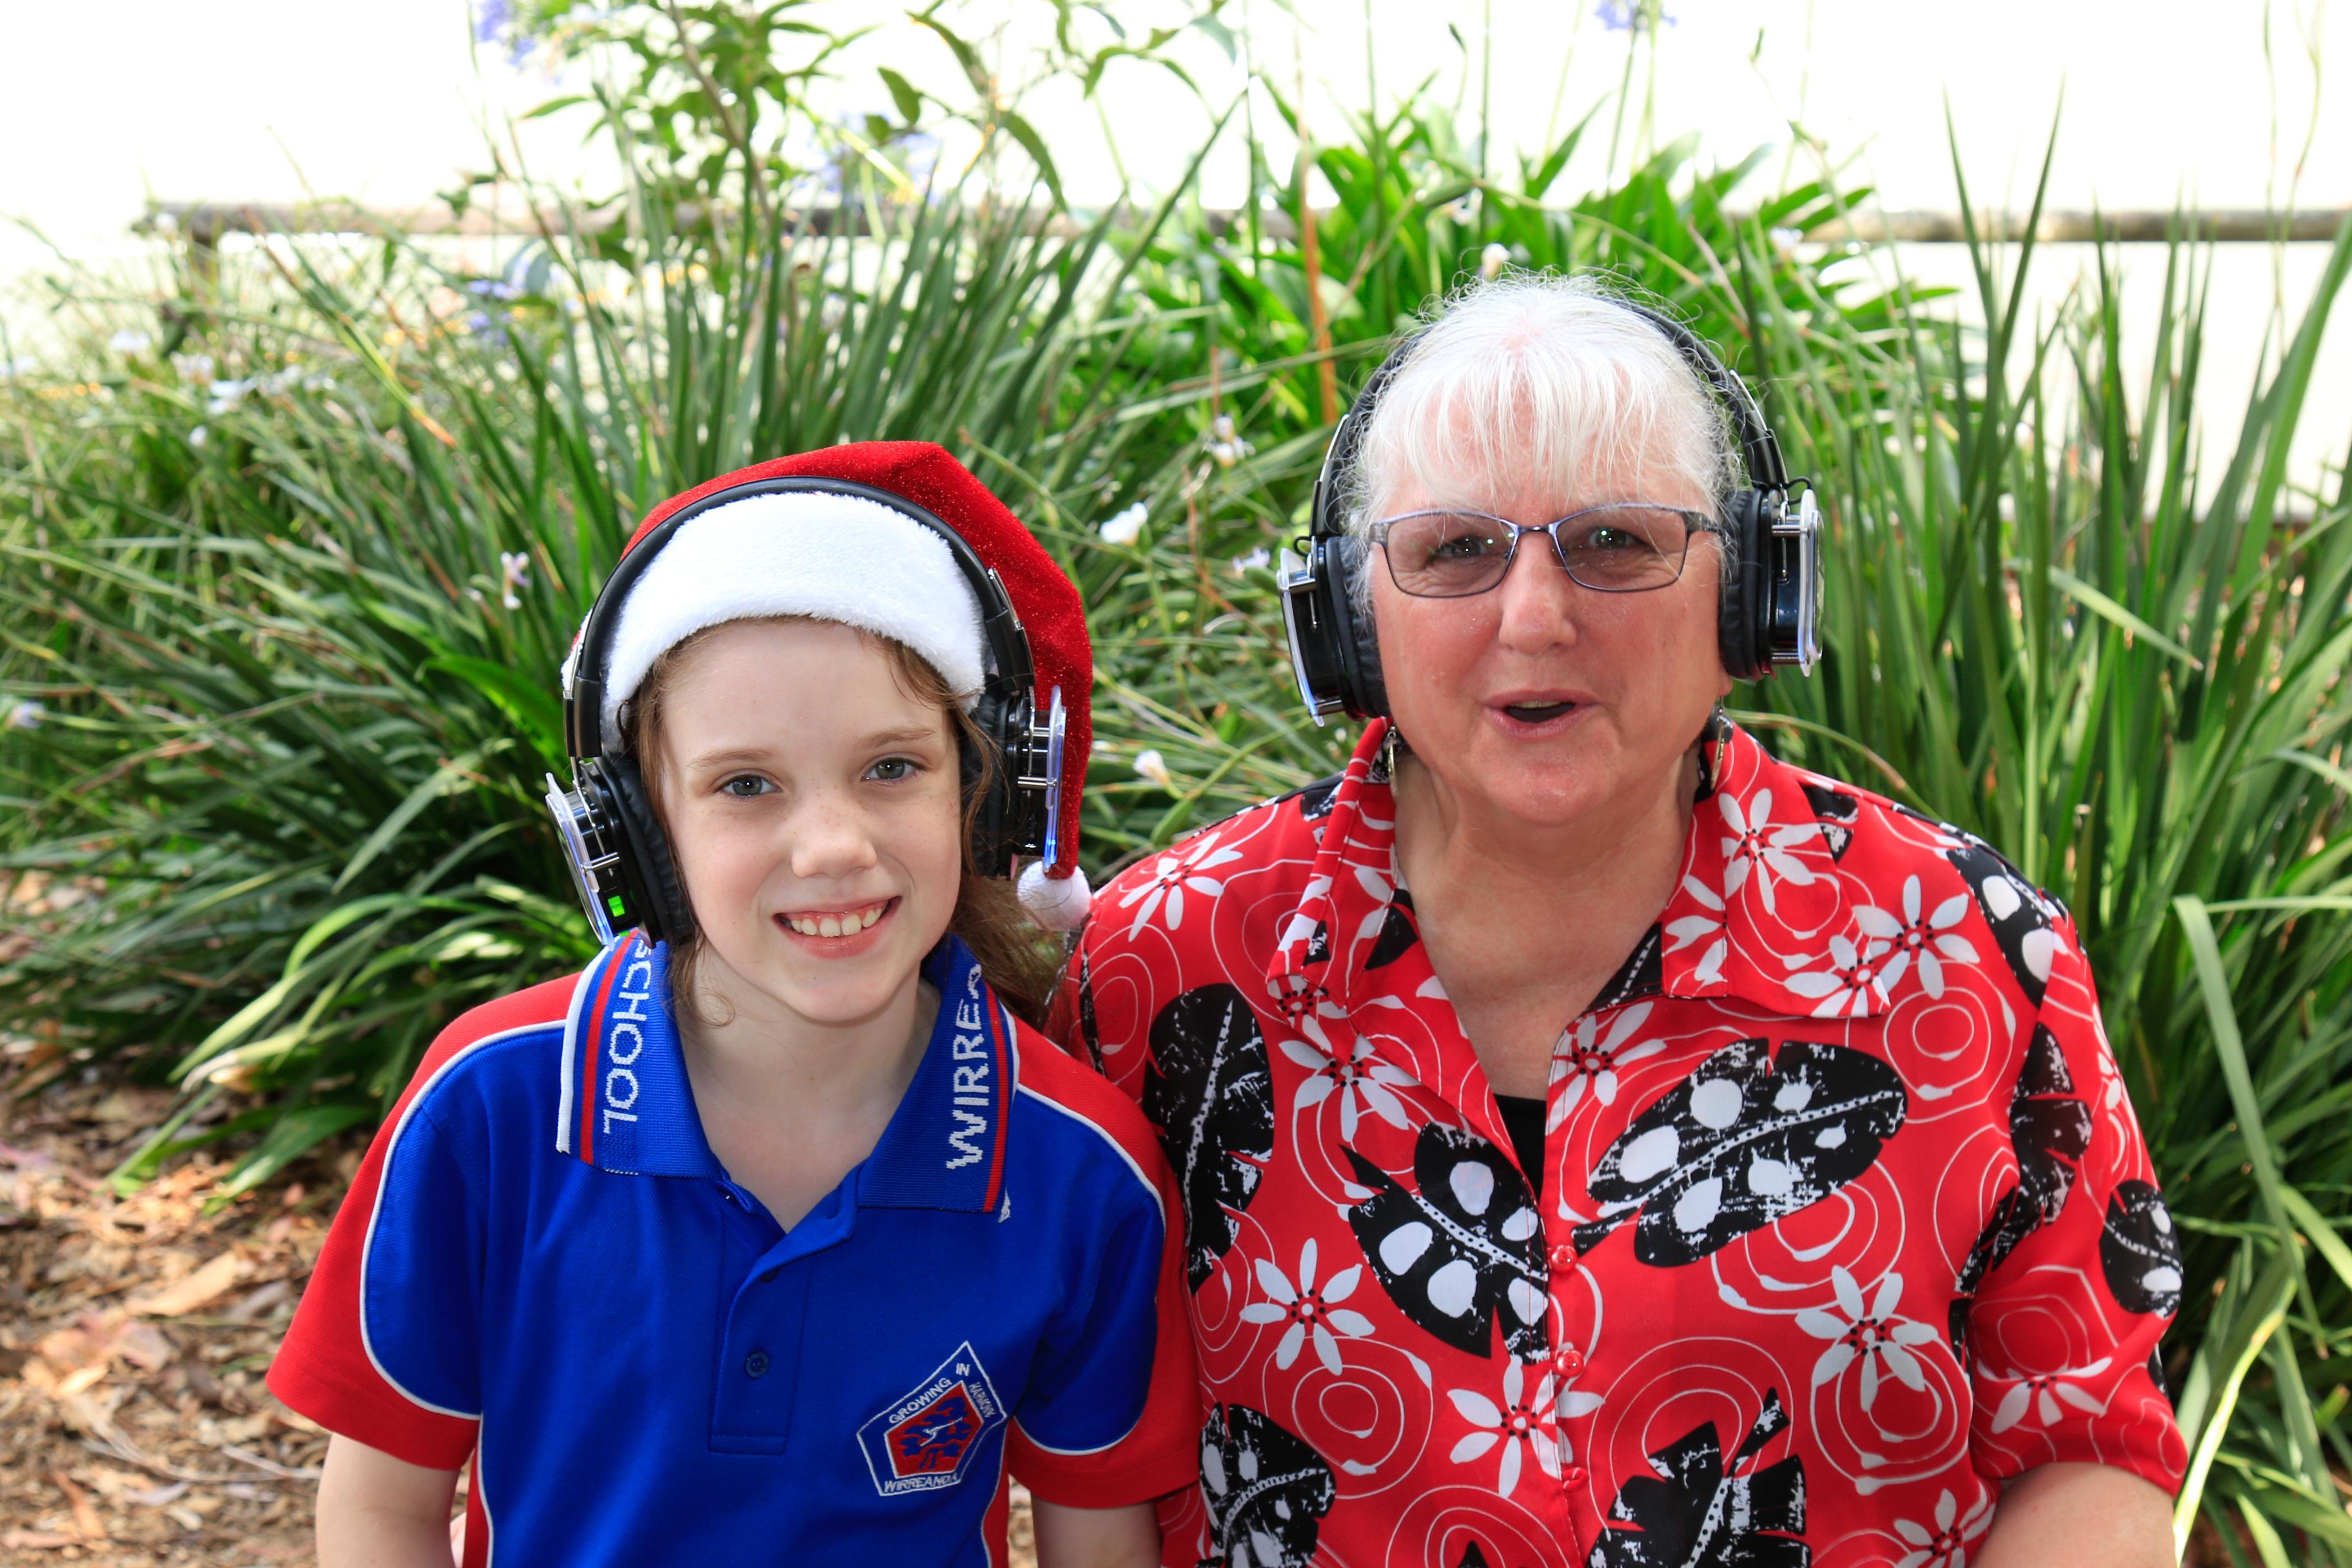 Jordyn Booth and Grandma.